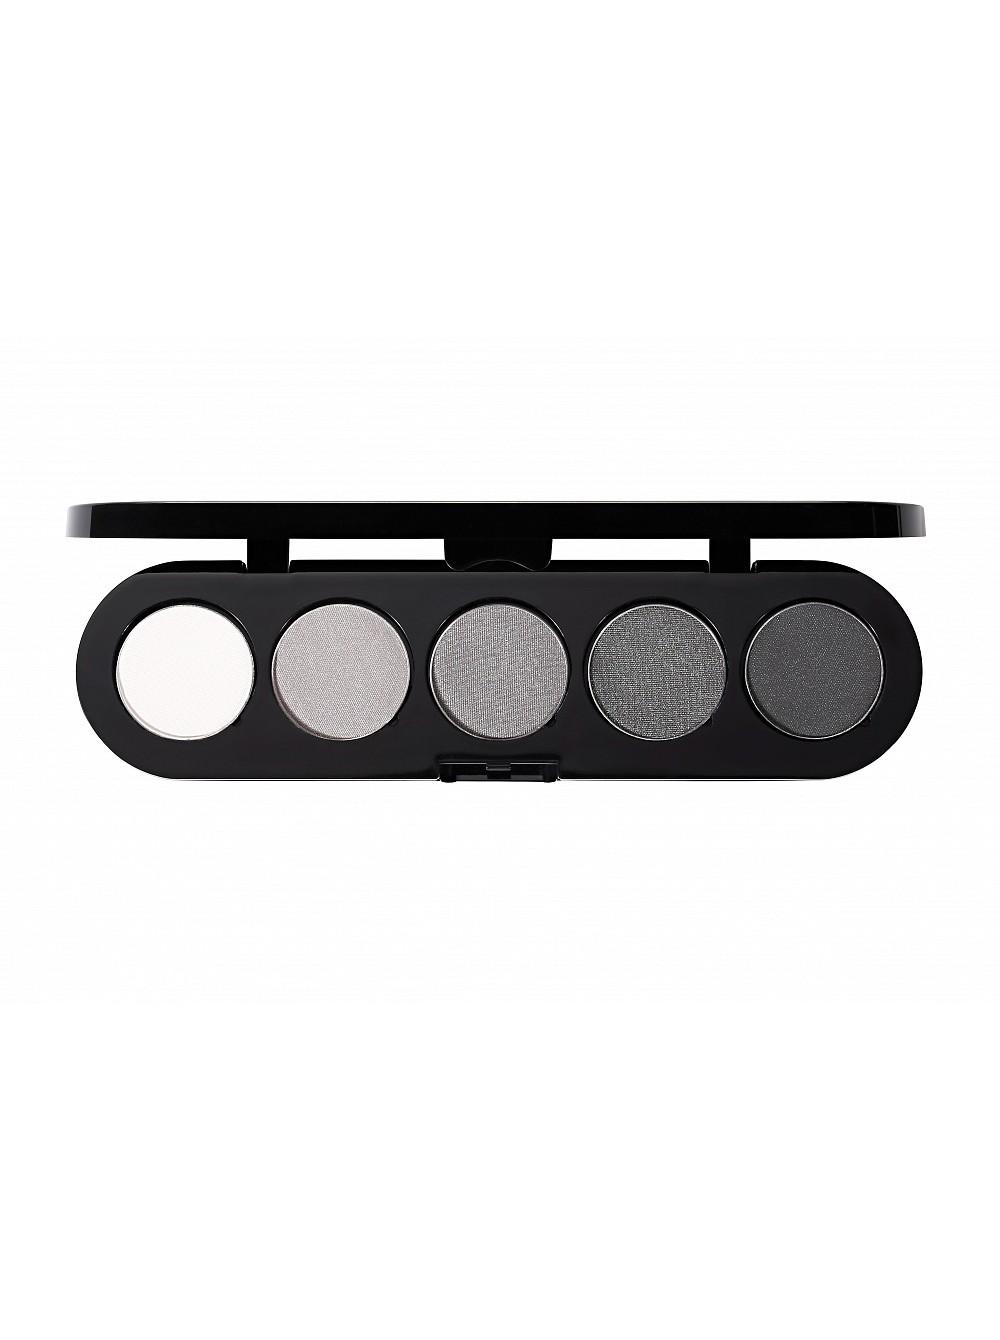 Косметика make up atelier купить в спб фармацерис косметика купить в польше